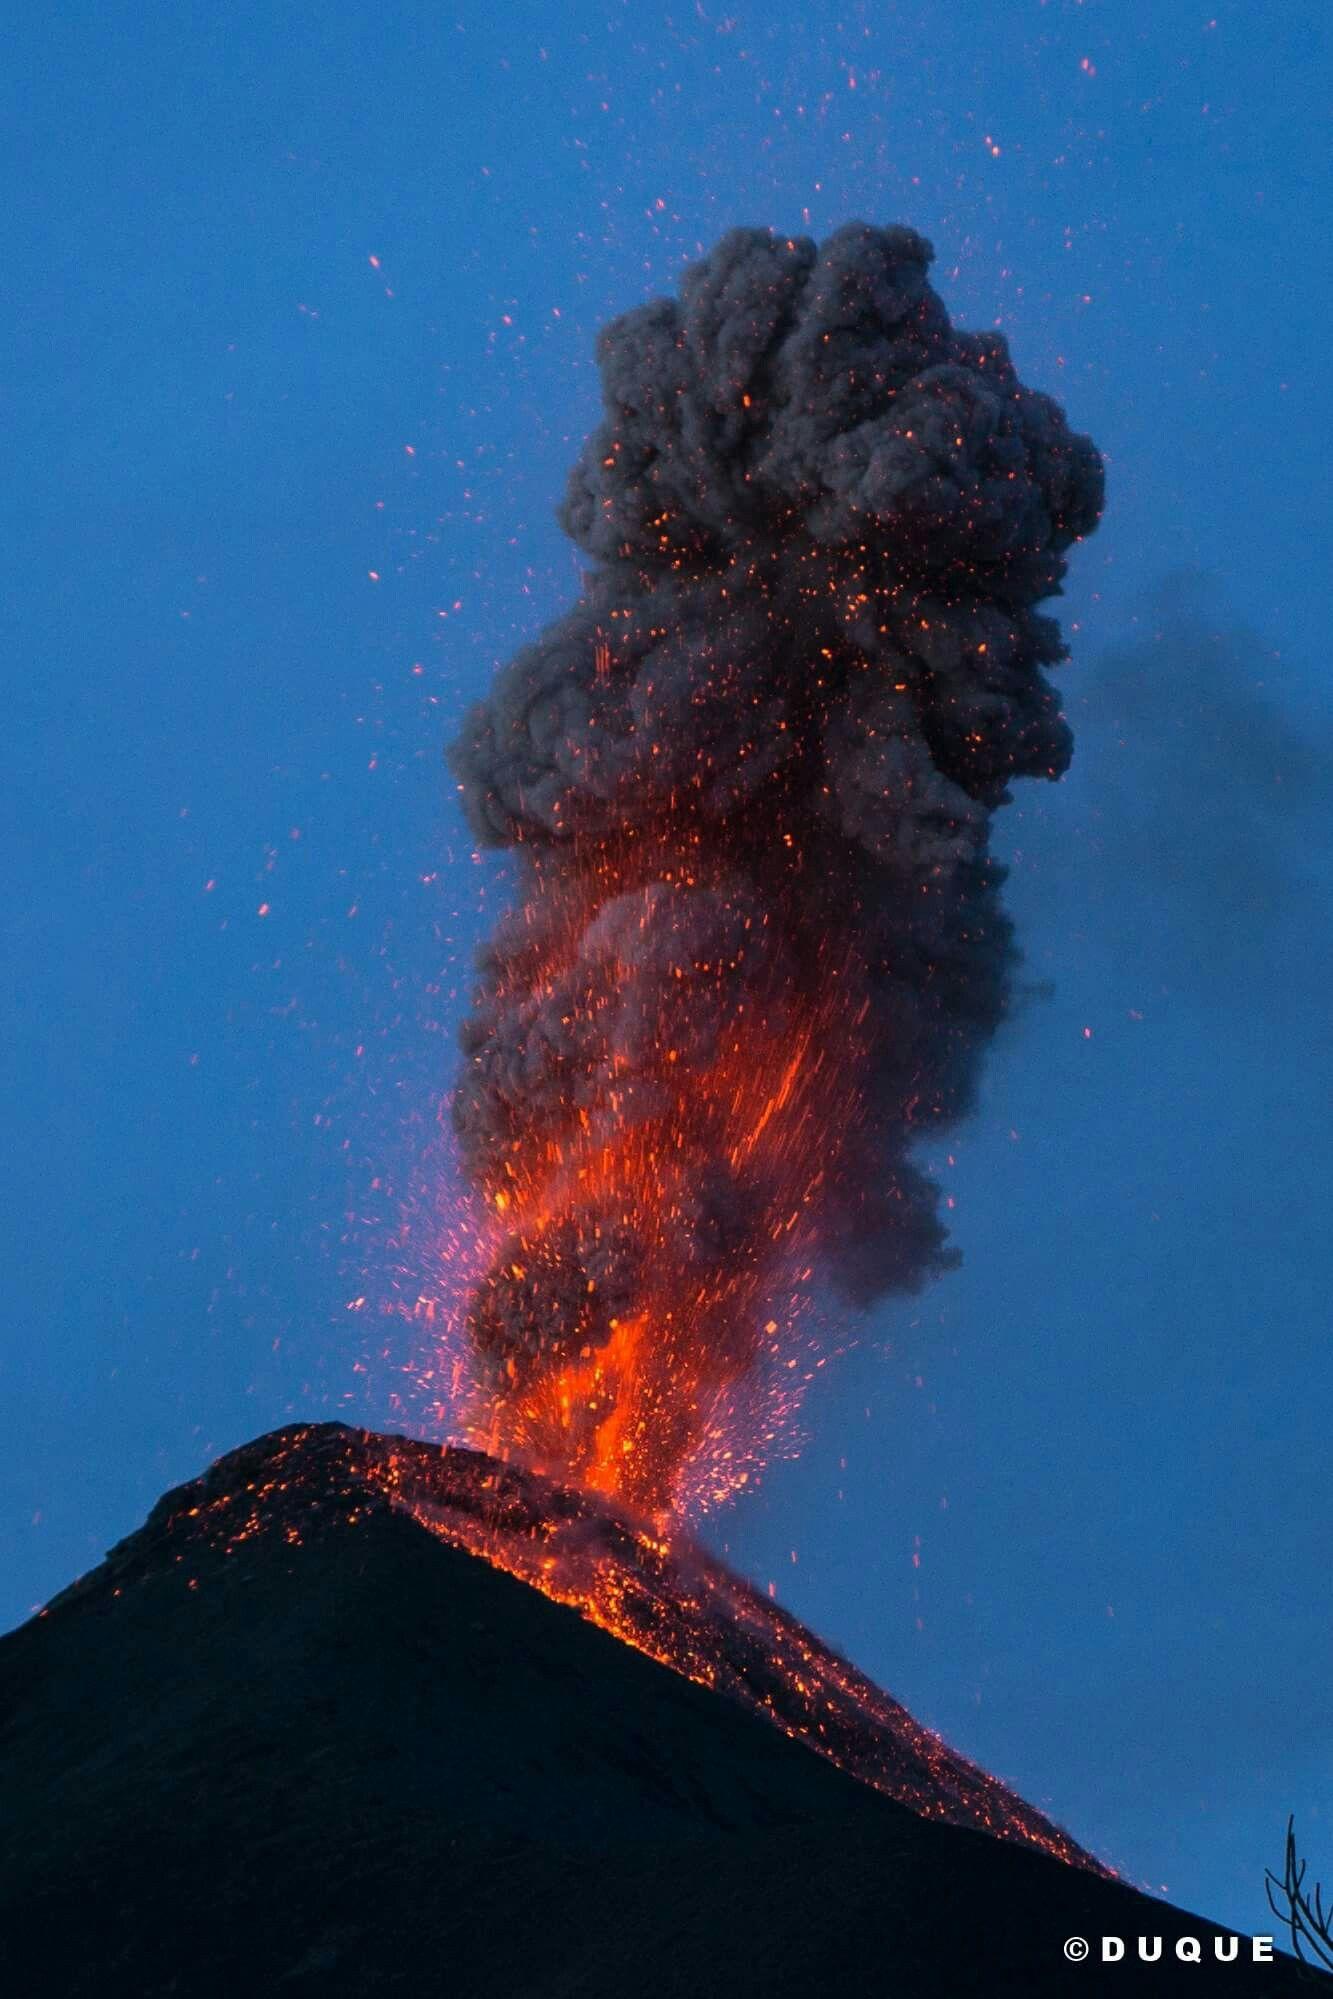 Volcán De Fuego Guatemala VOLCANIC ERUPTIONS Pinterest - Incredible neon blue lava flames erupt volcano